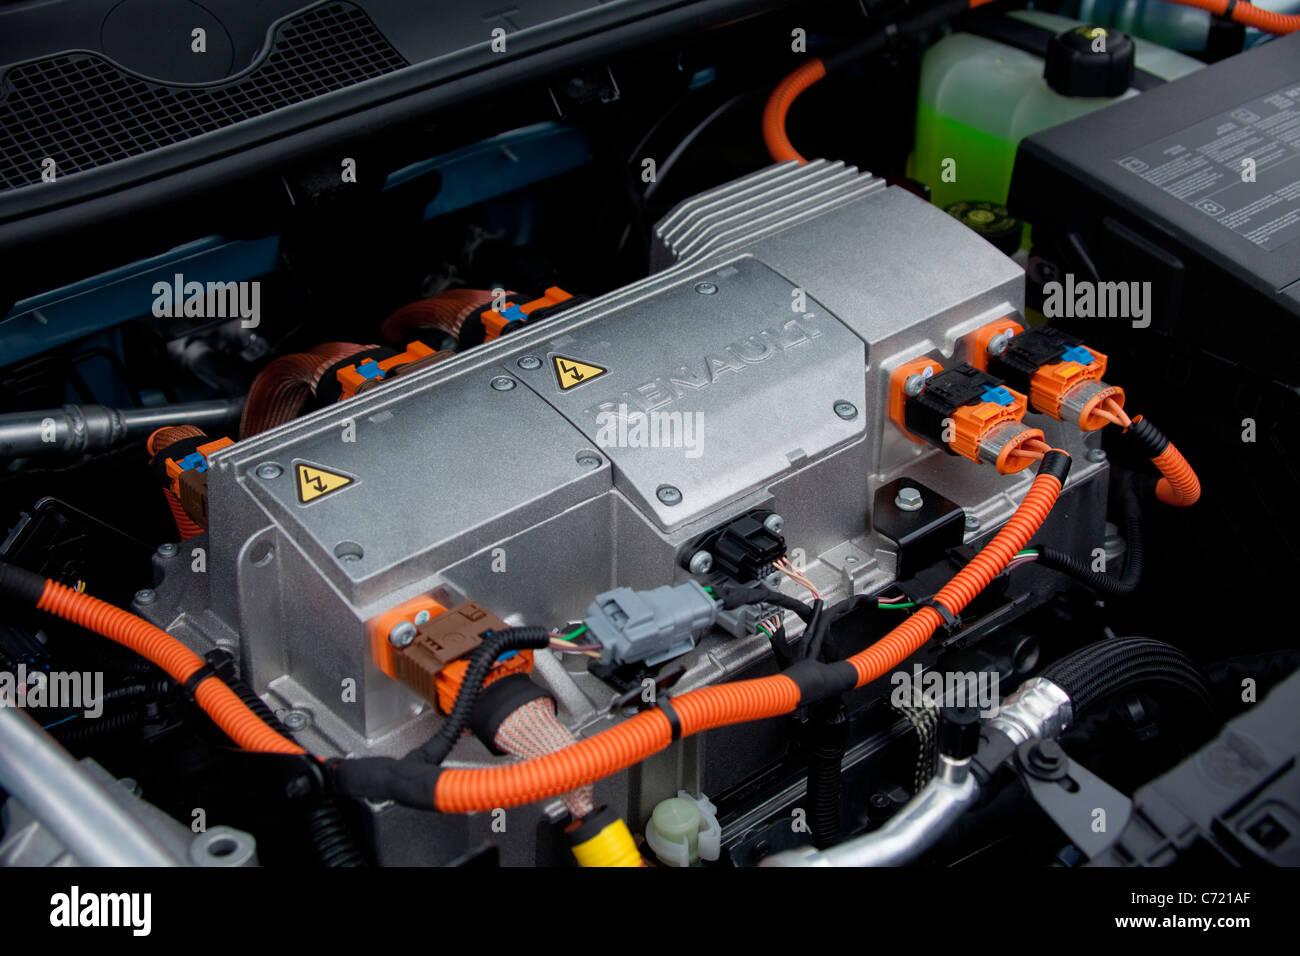 Electric Car Engine Stock Photos & Electric Car Engine Stock Images ...